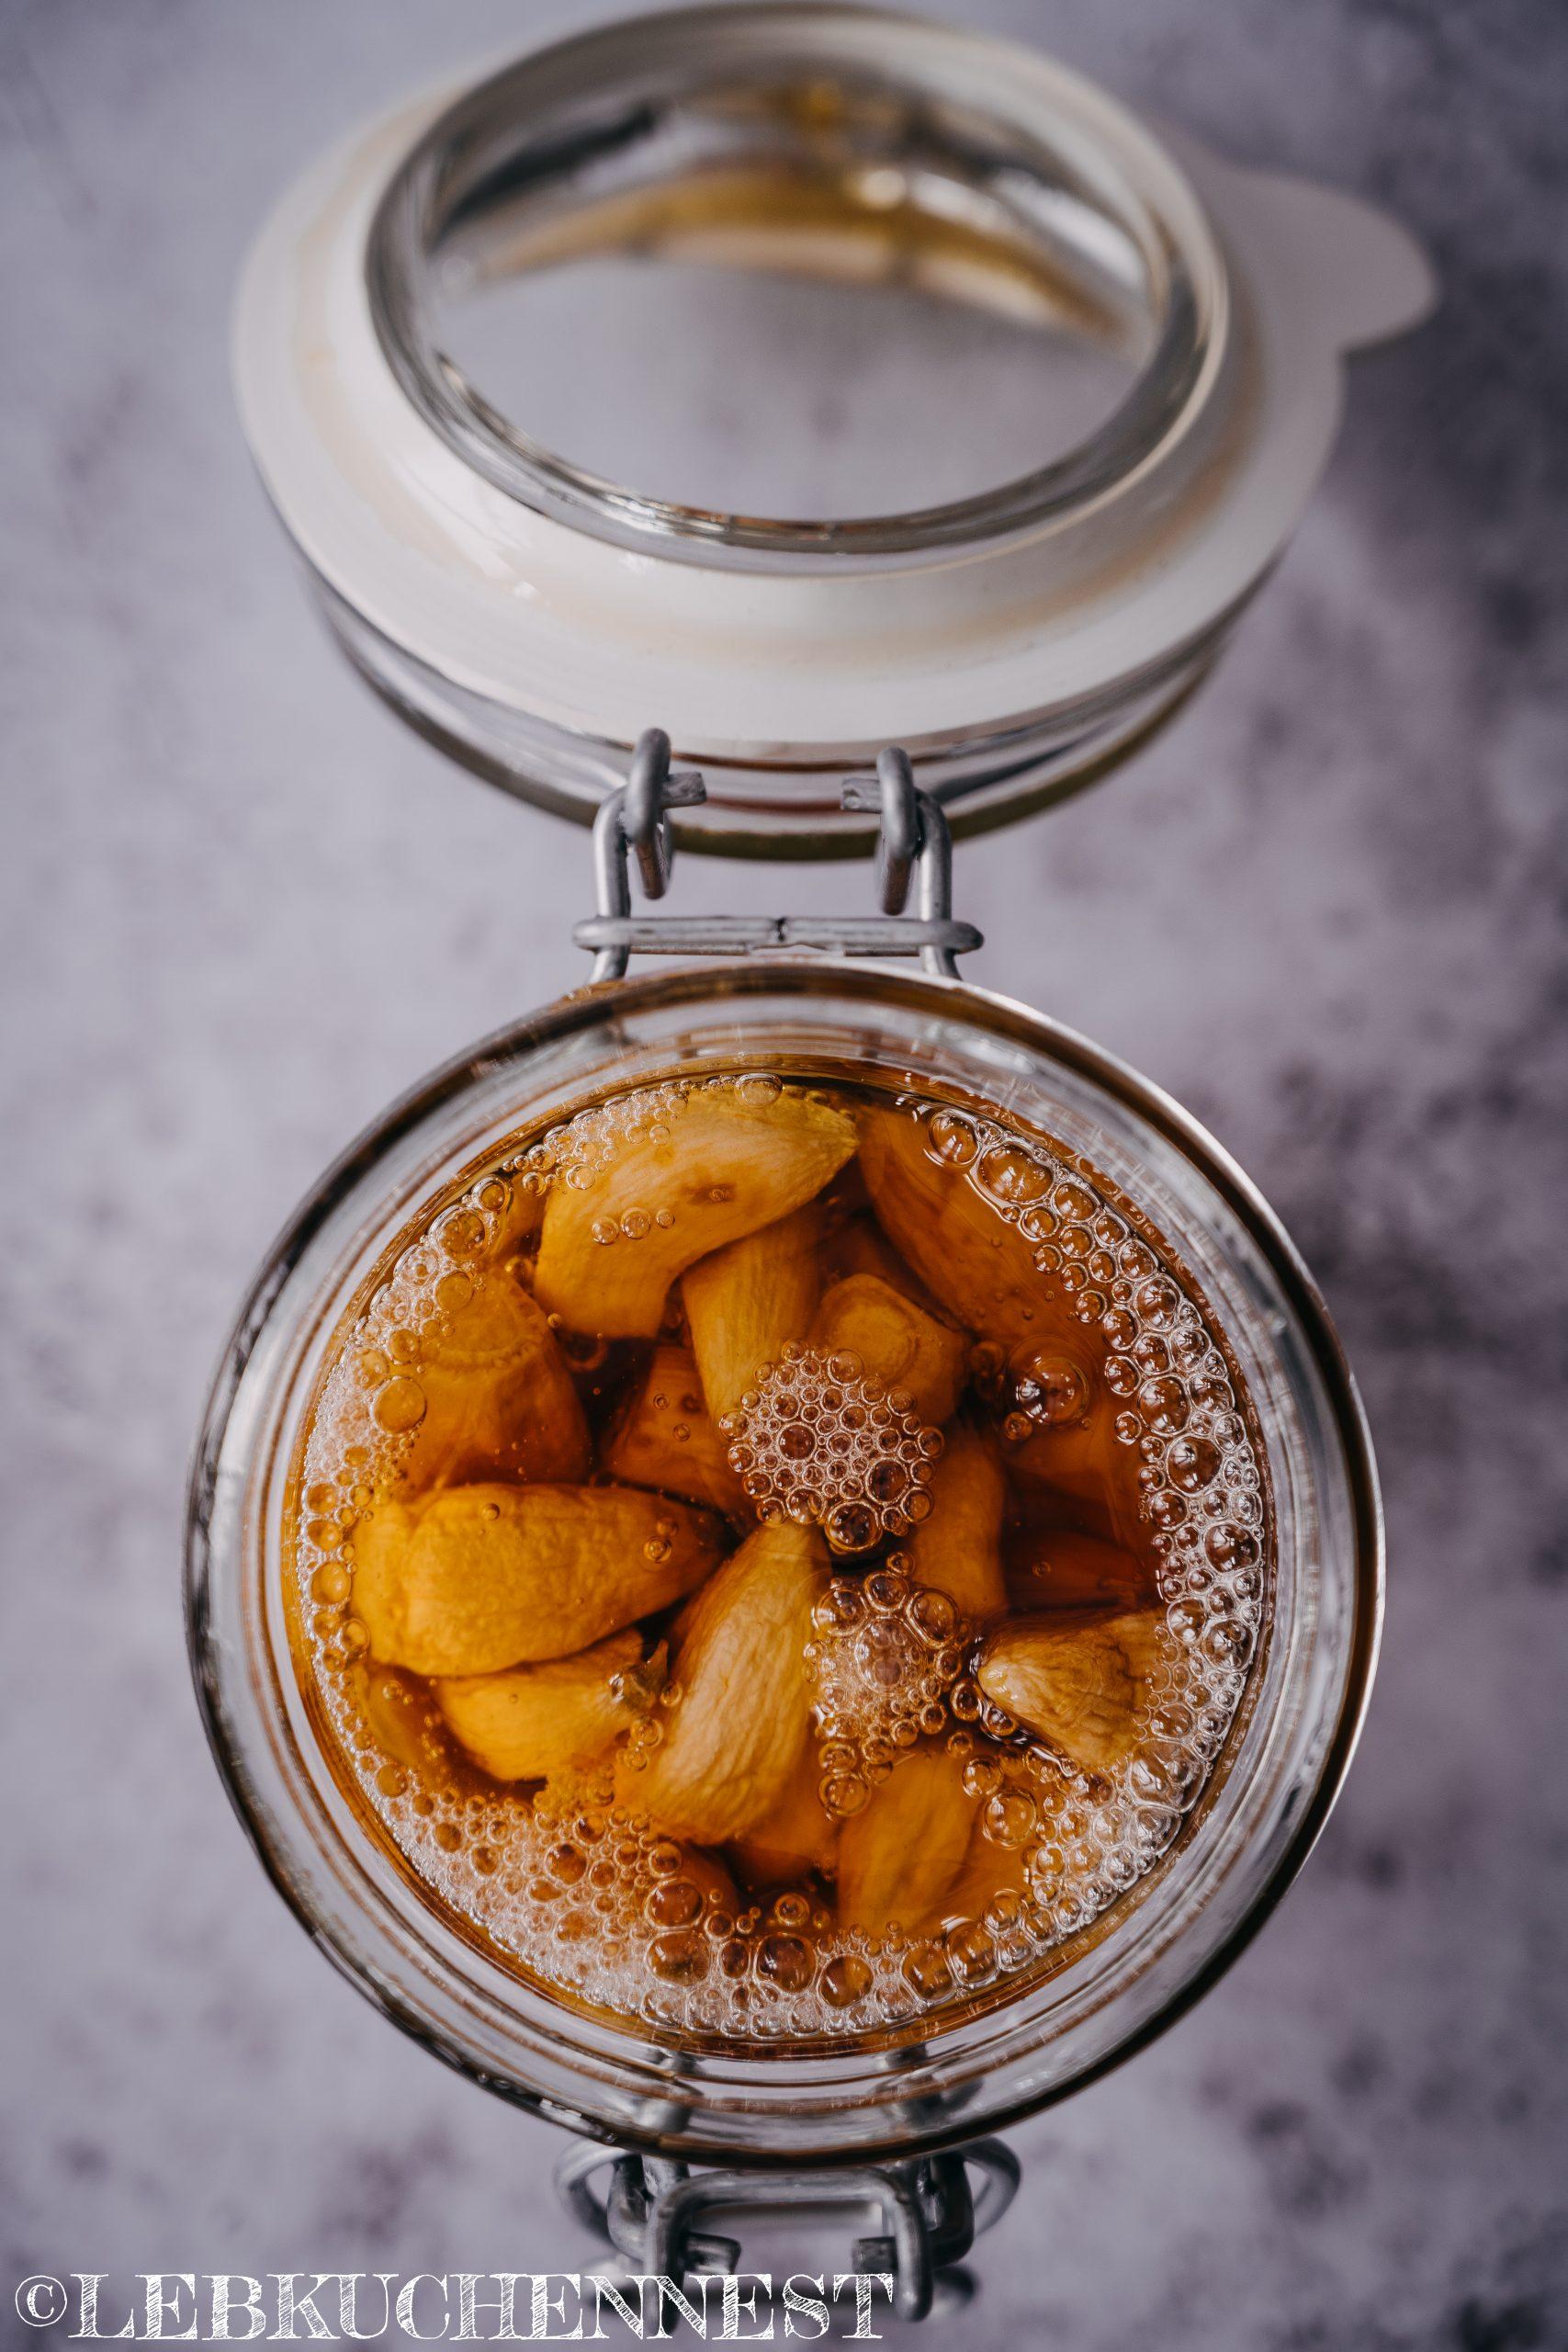 Fermentation - Knoblauch in Honig gereift